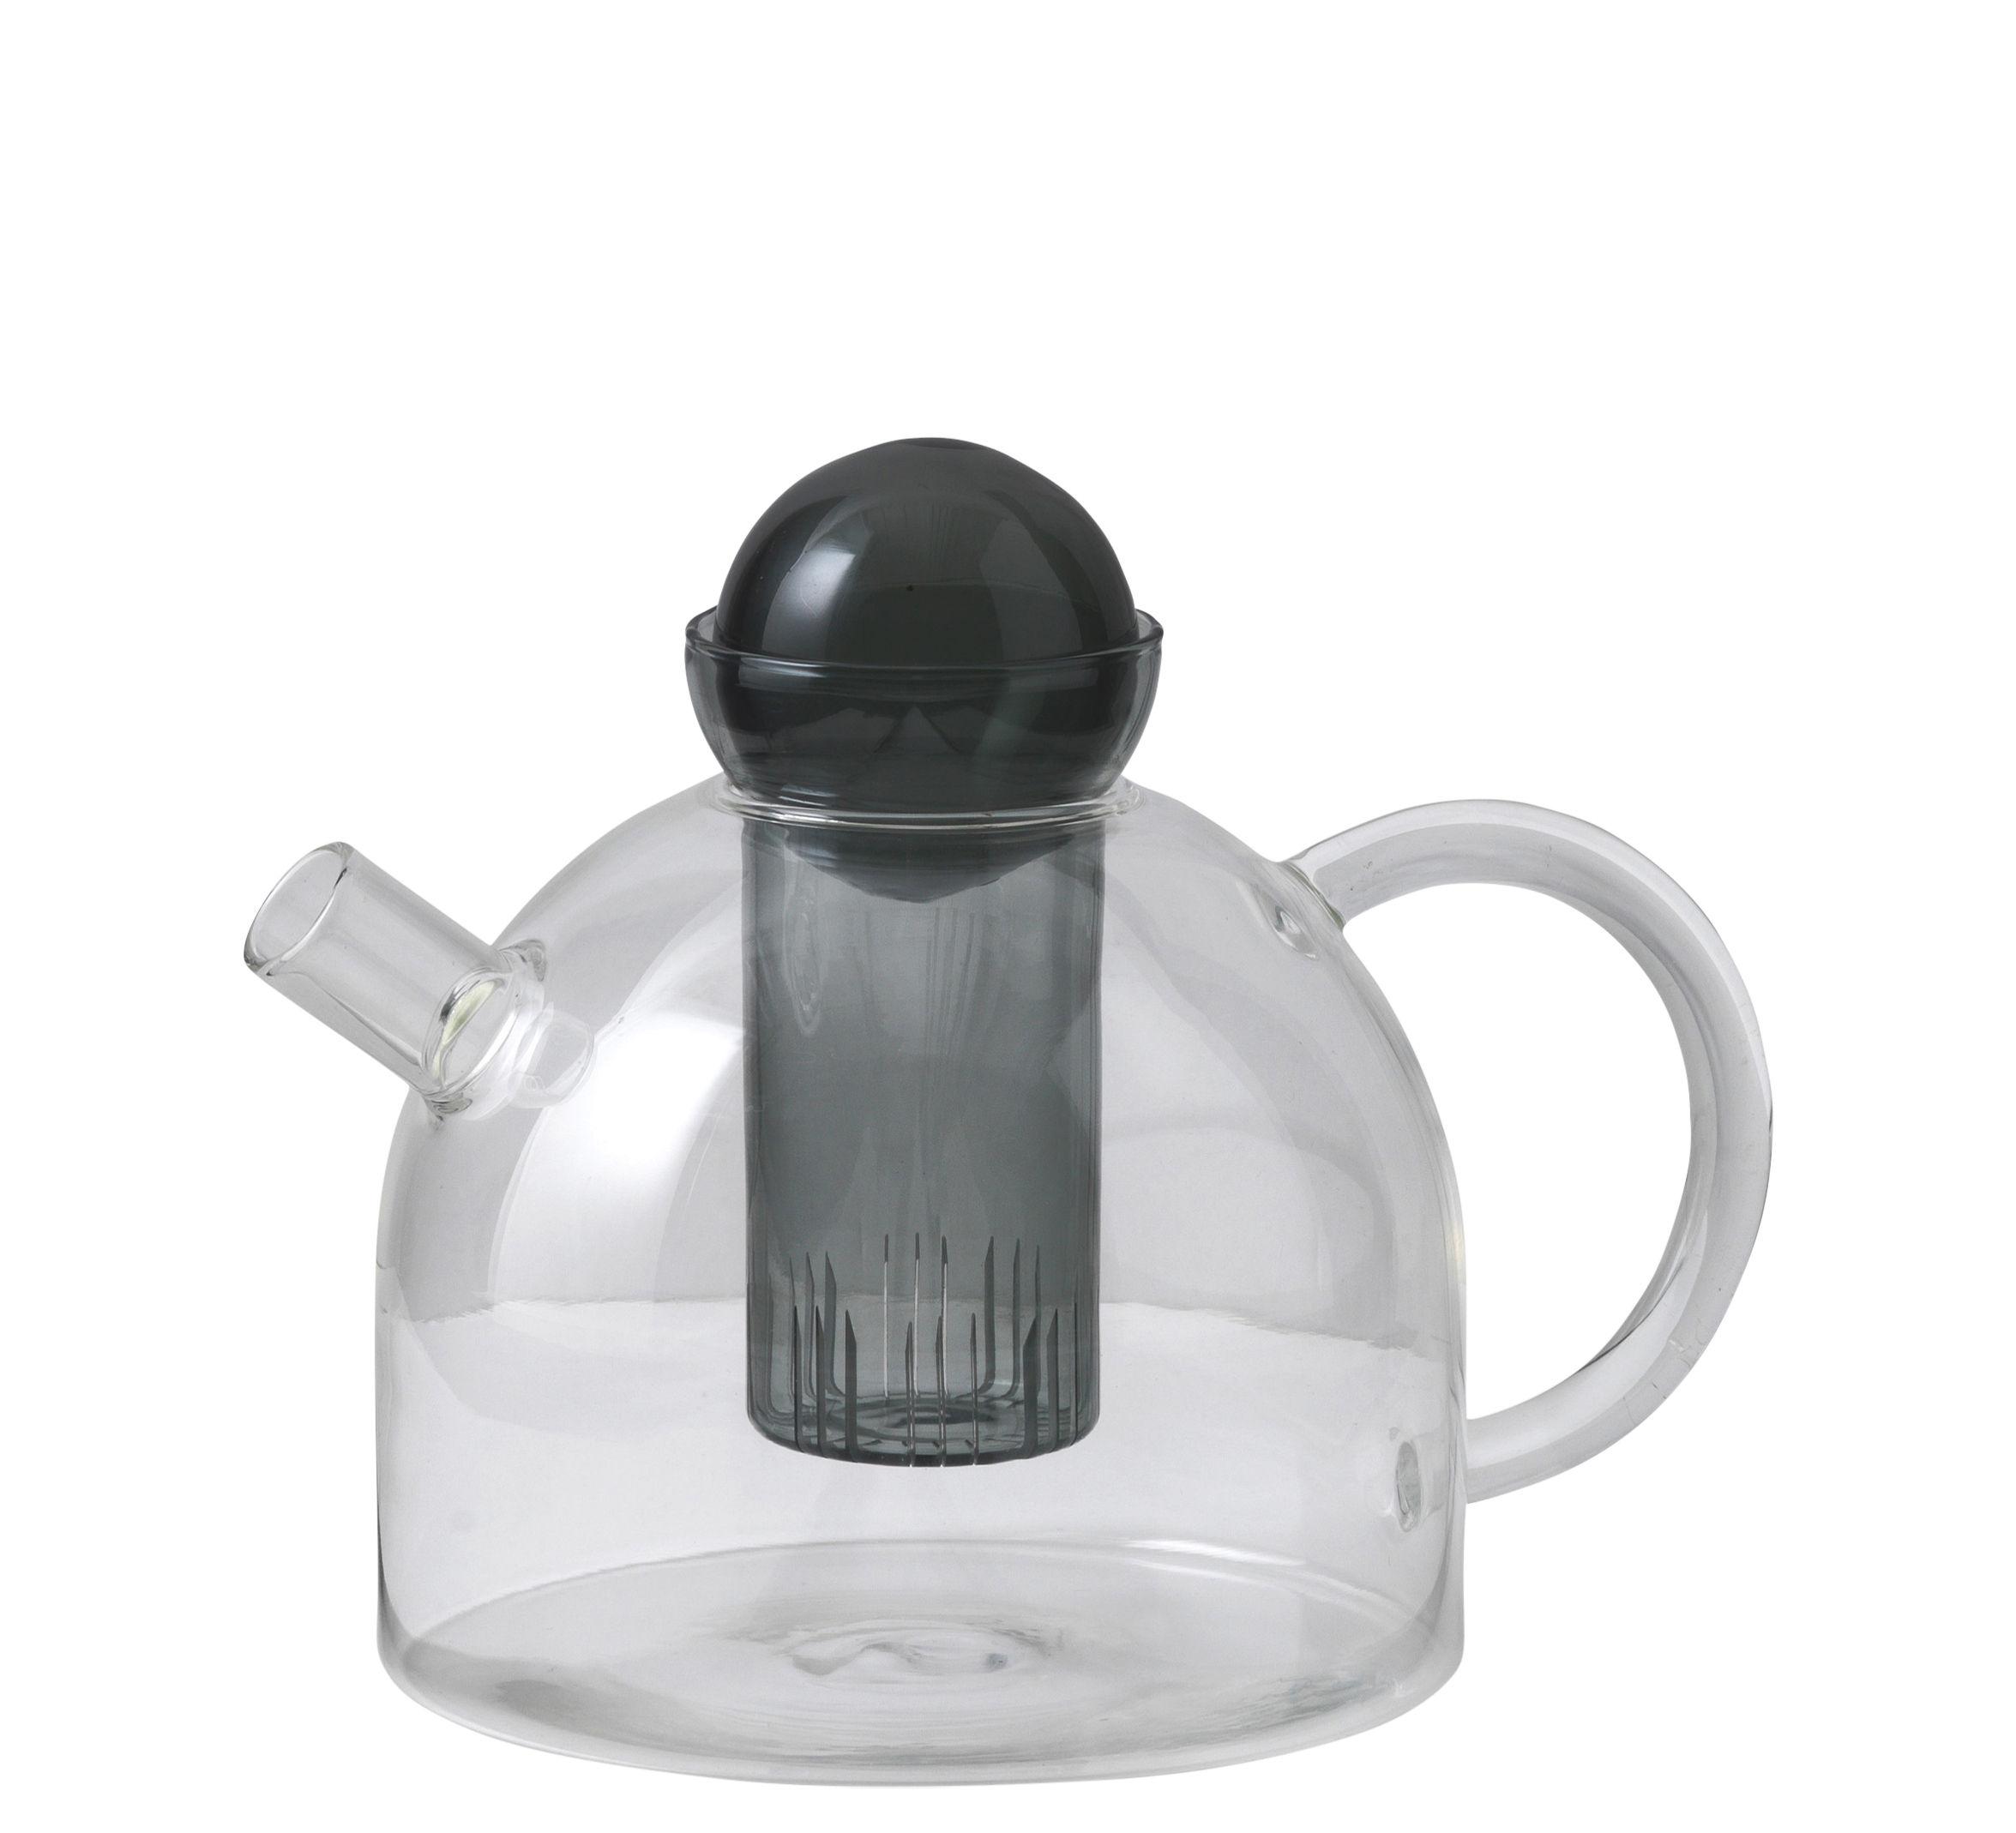 Kitchenware - Kettles & Teapots - Still Teapot - / 1.25 L - Hand-blown glass by Ferm Living - Transparent / Black - Mouth blown glass